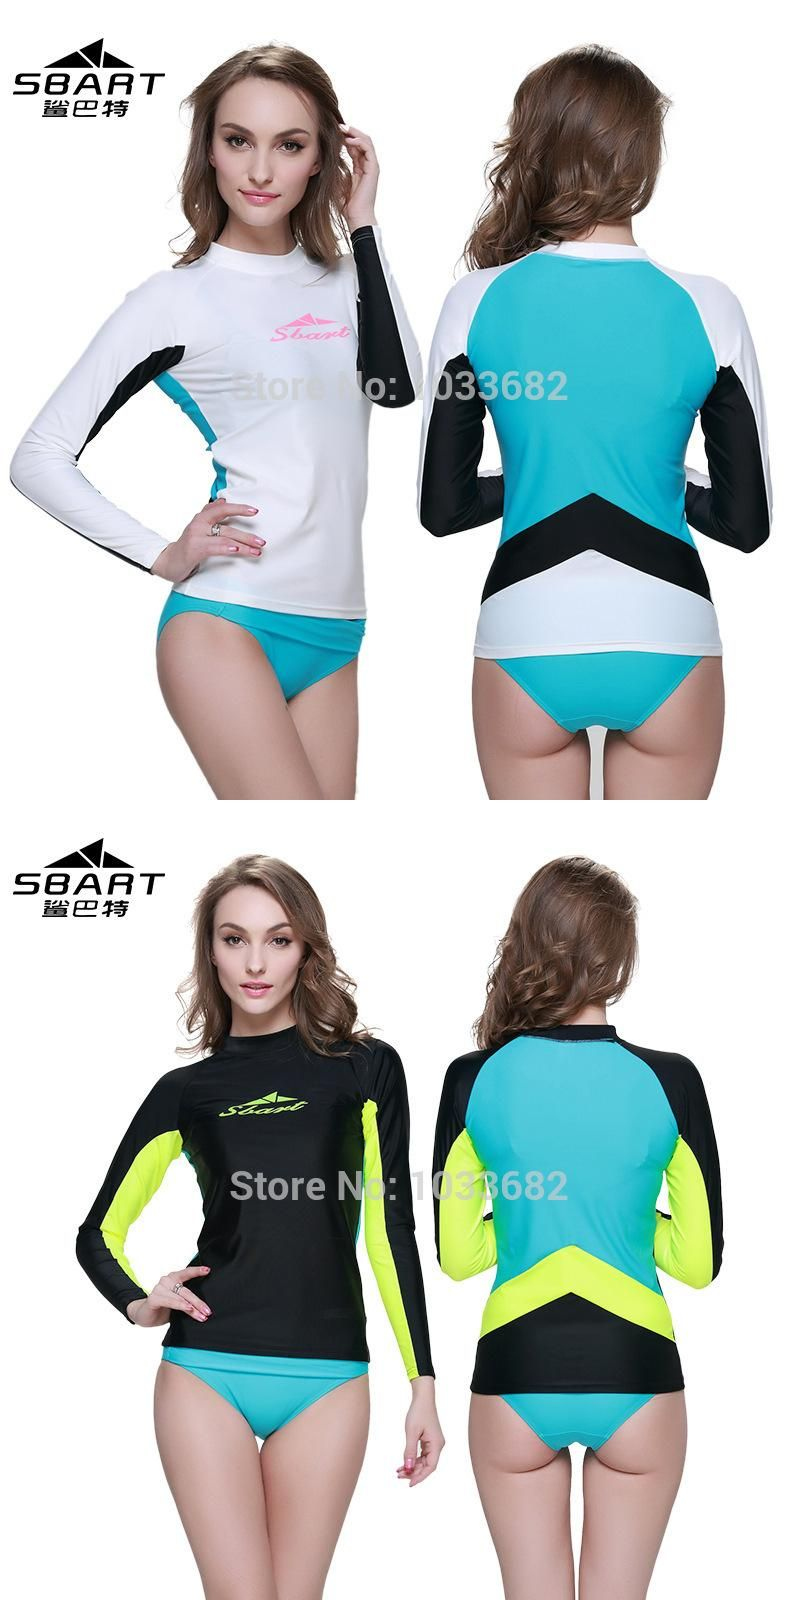 90dbc25a16b [Visit to Buy] SBART Brand Rashguard Women Swim Shirts Womens Rash Guard  Swimwear Lycra Surf Rushguard Top Quality Rush Guard Swimsuit #Advertisement